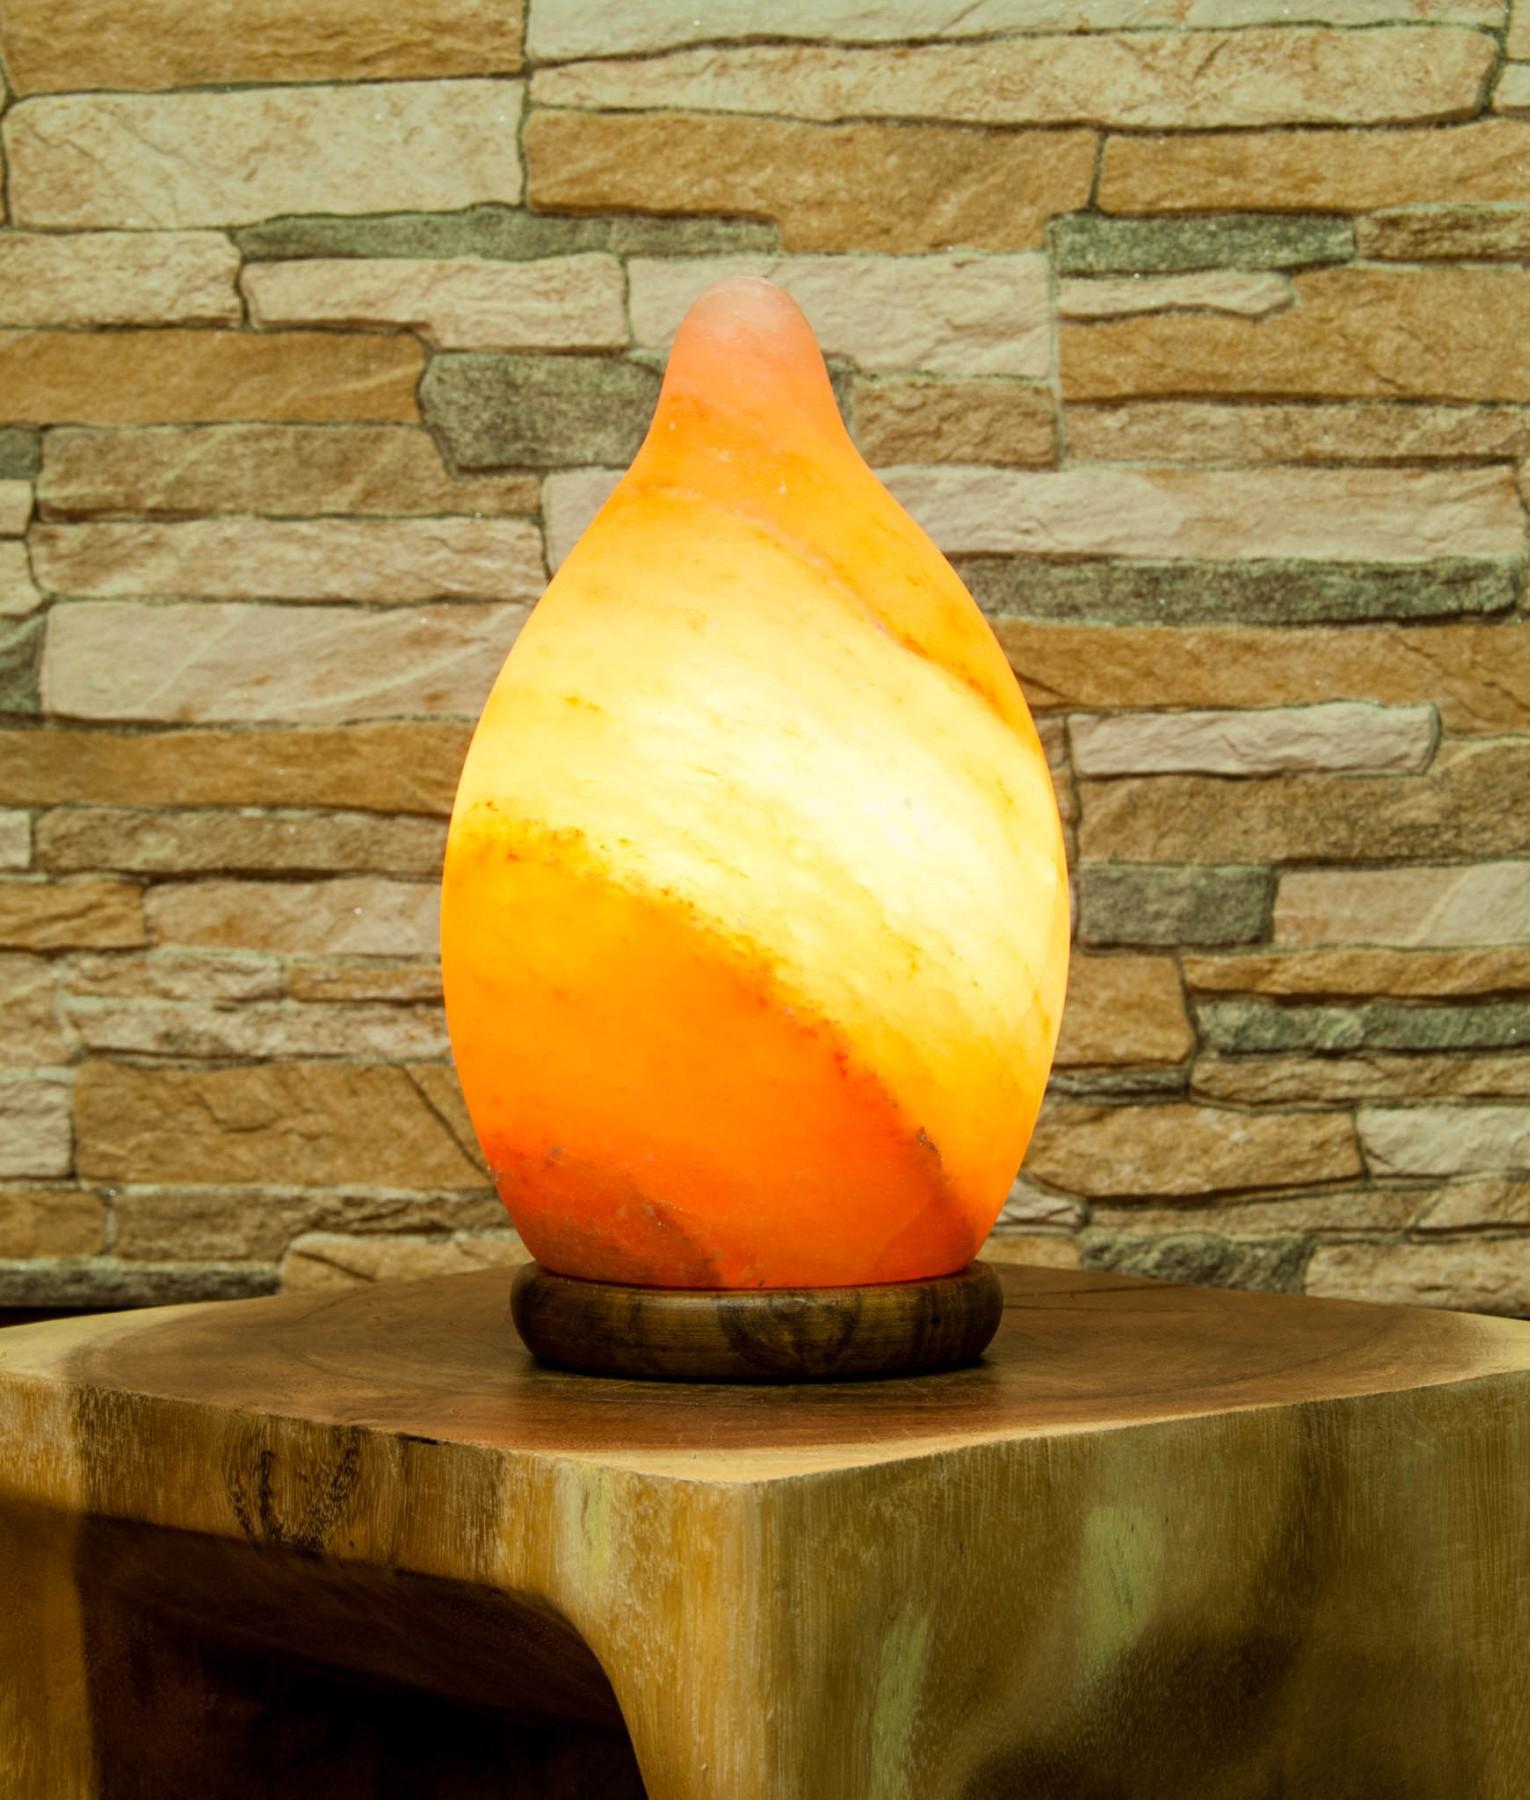 Salz tropfen lampe aurelies hexenladen for Wohnungs deko